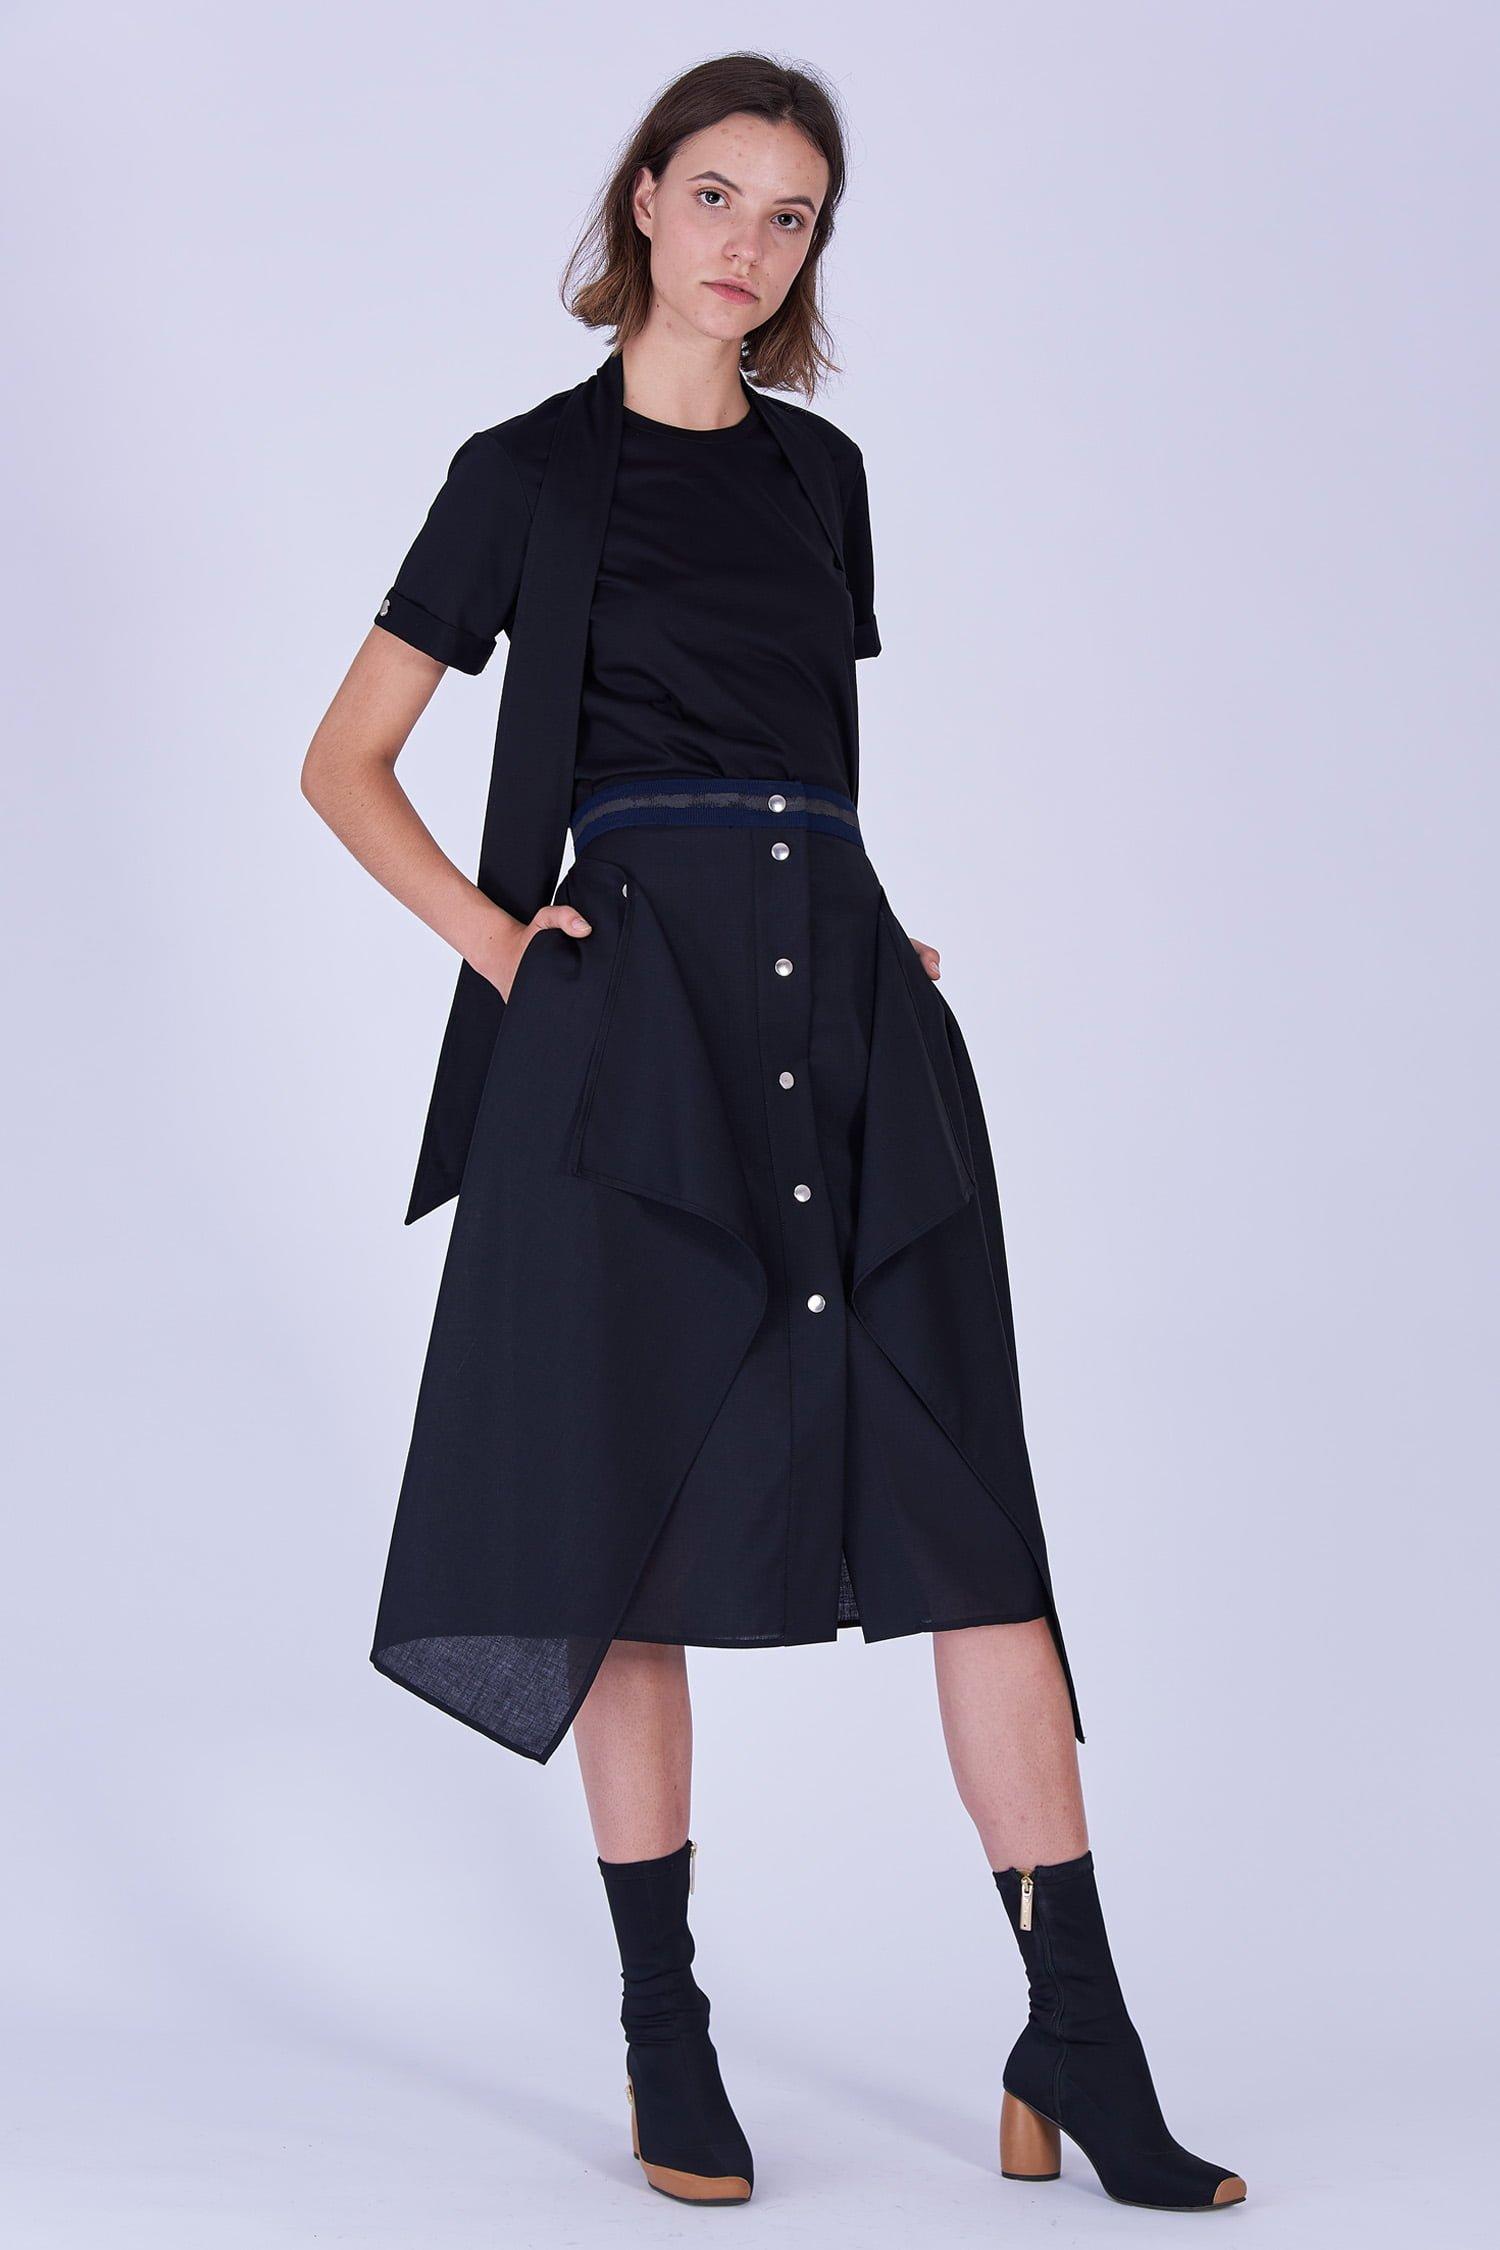 Acephala Fw19 20 Black Skirt Draped Czarna Spodnica Drapowana Side 2